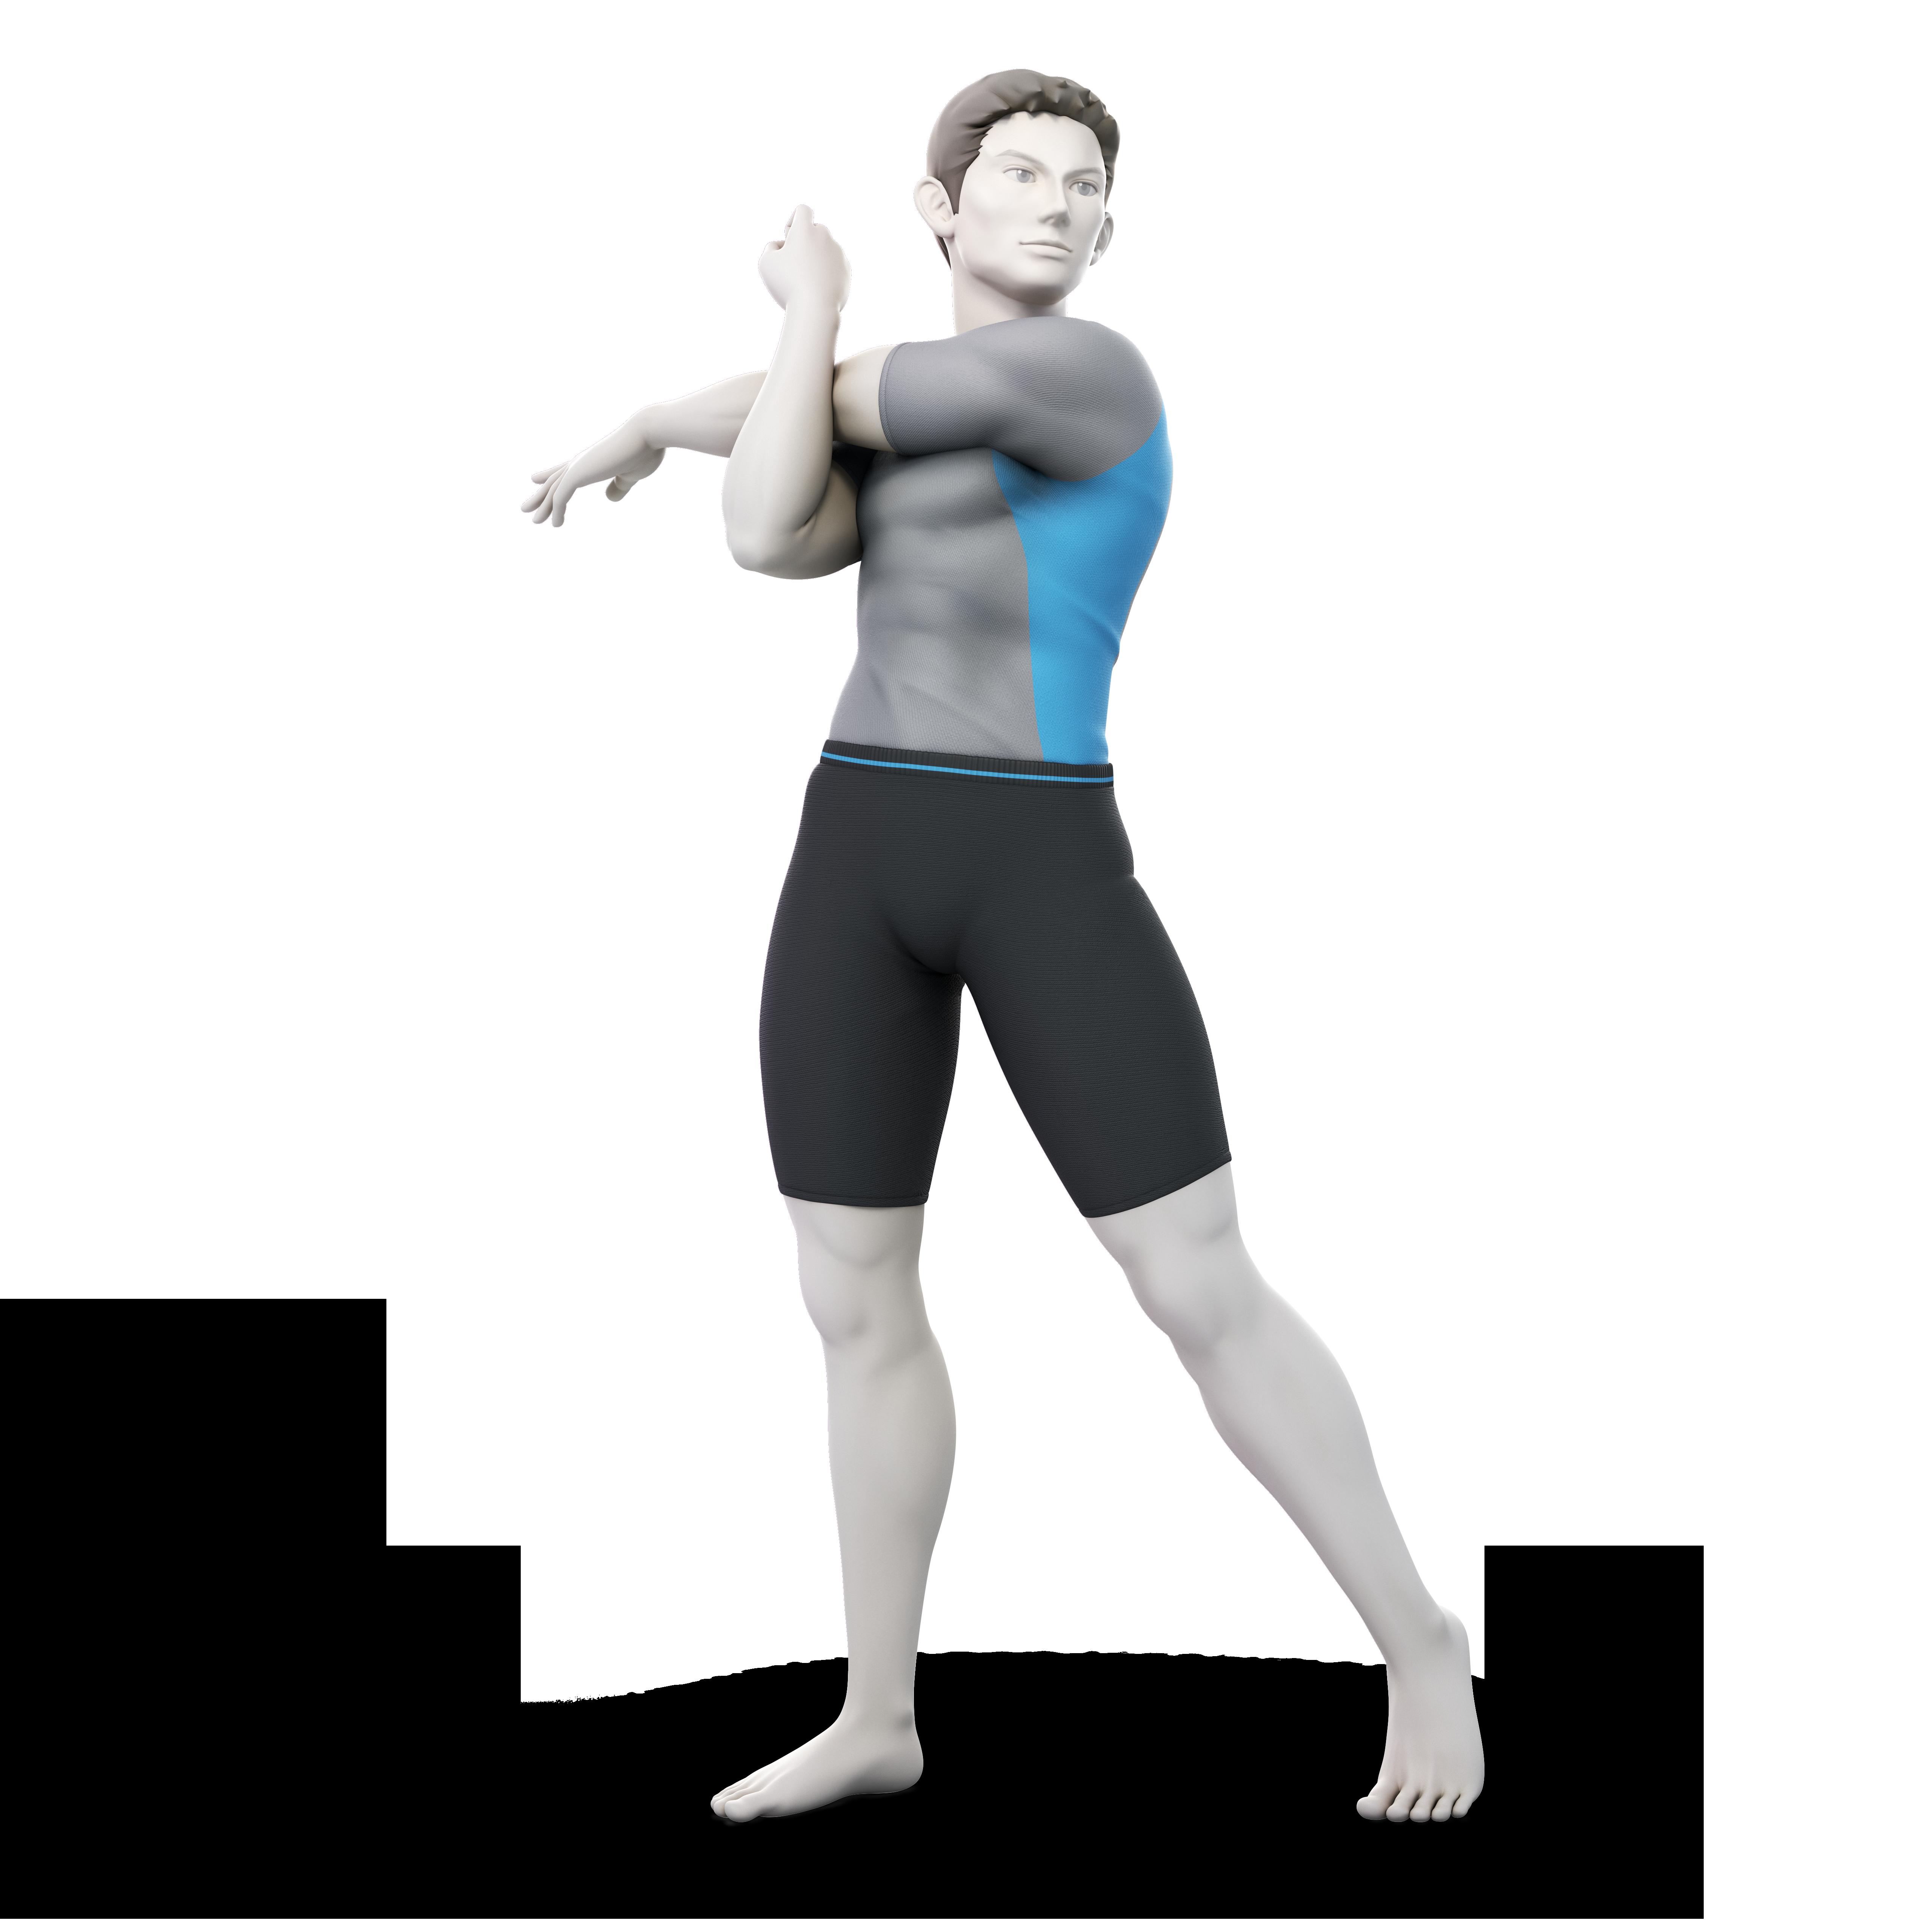 Wii Fit Trainer (Super Smash Bros. Ultimate)